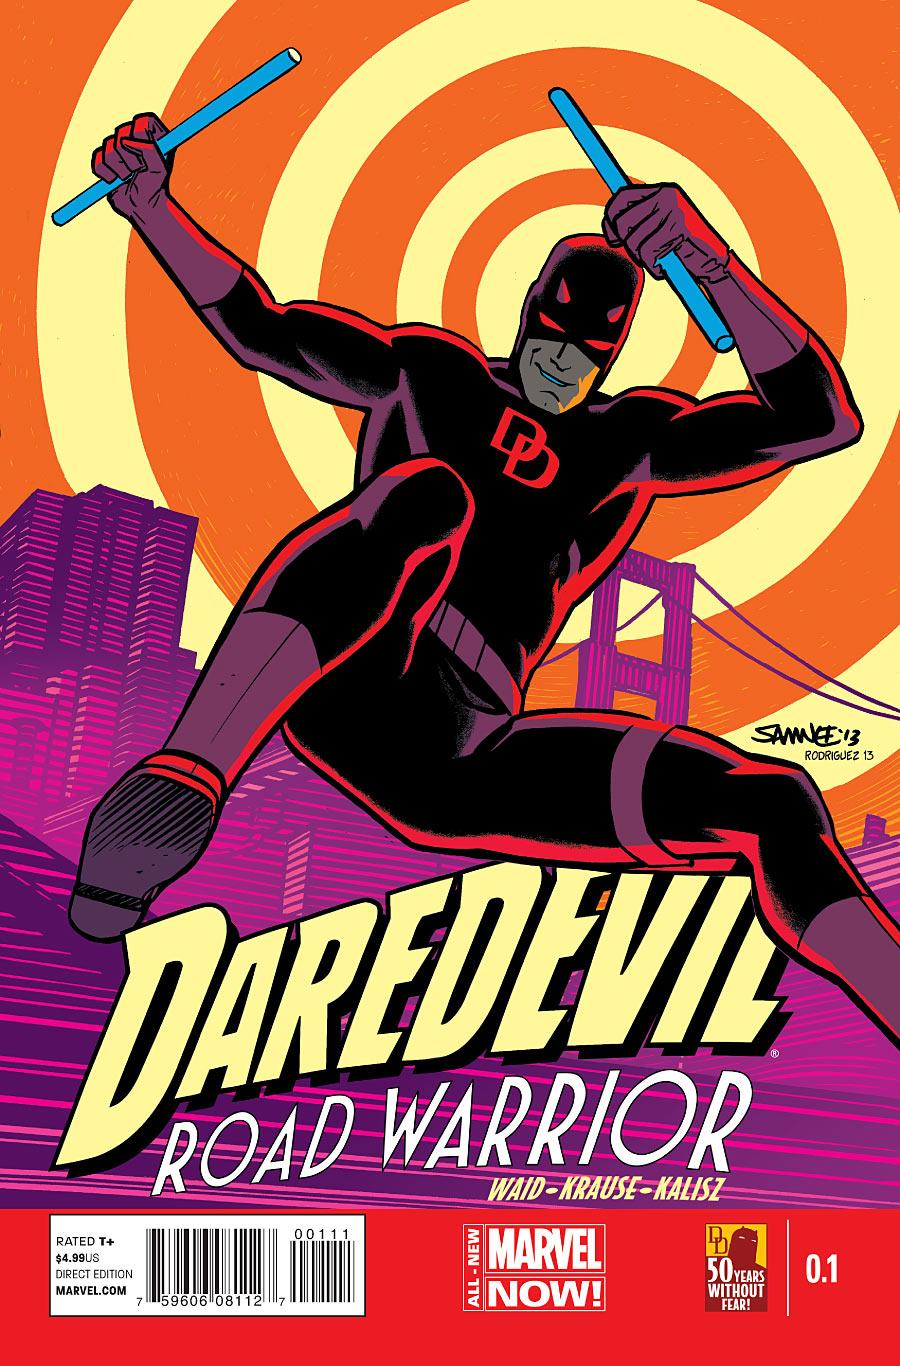 Daredevil 0.1 - Road Warrior